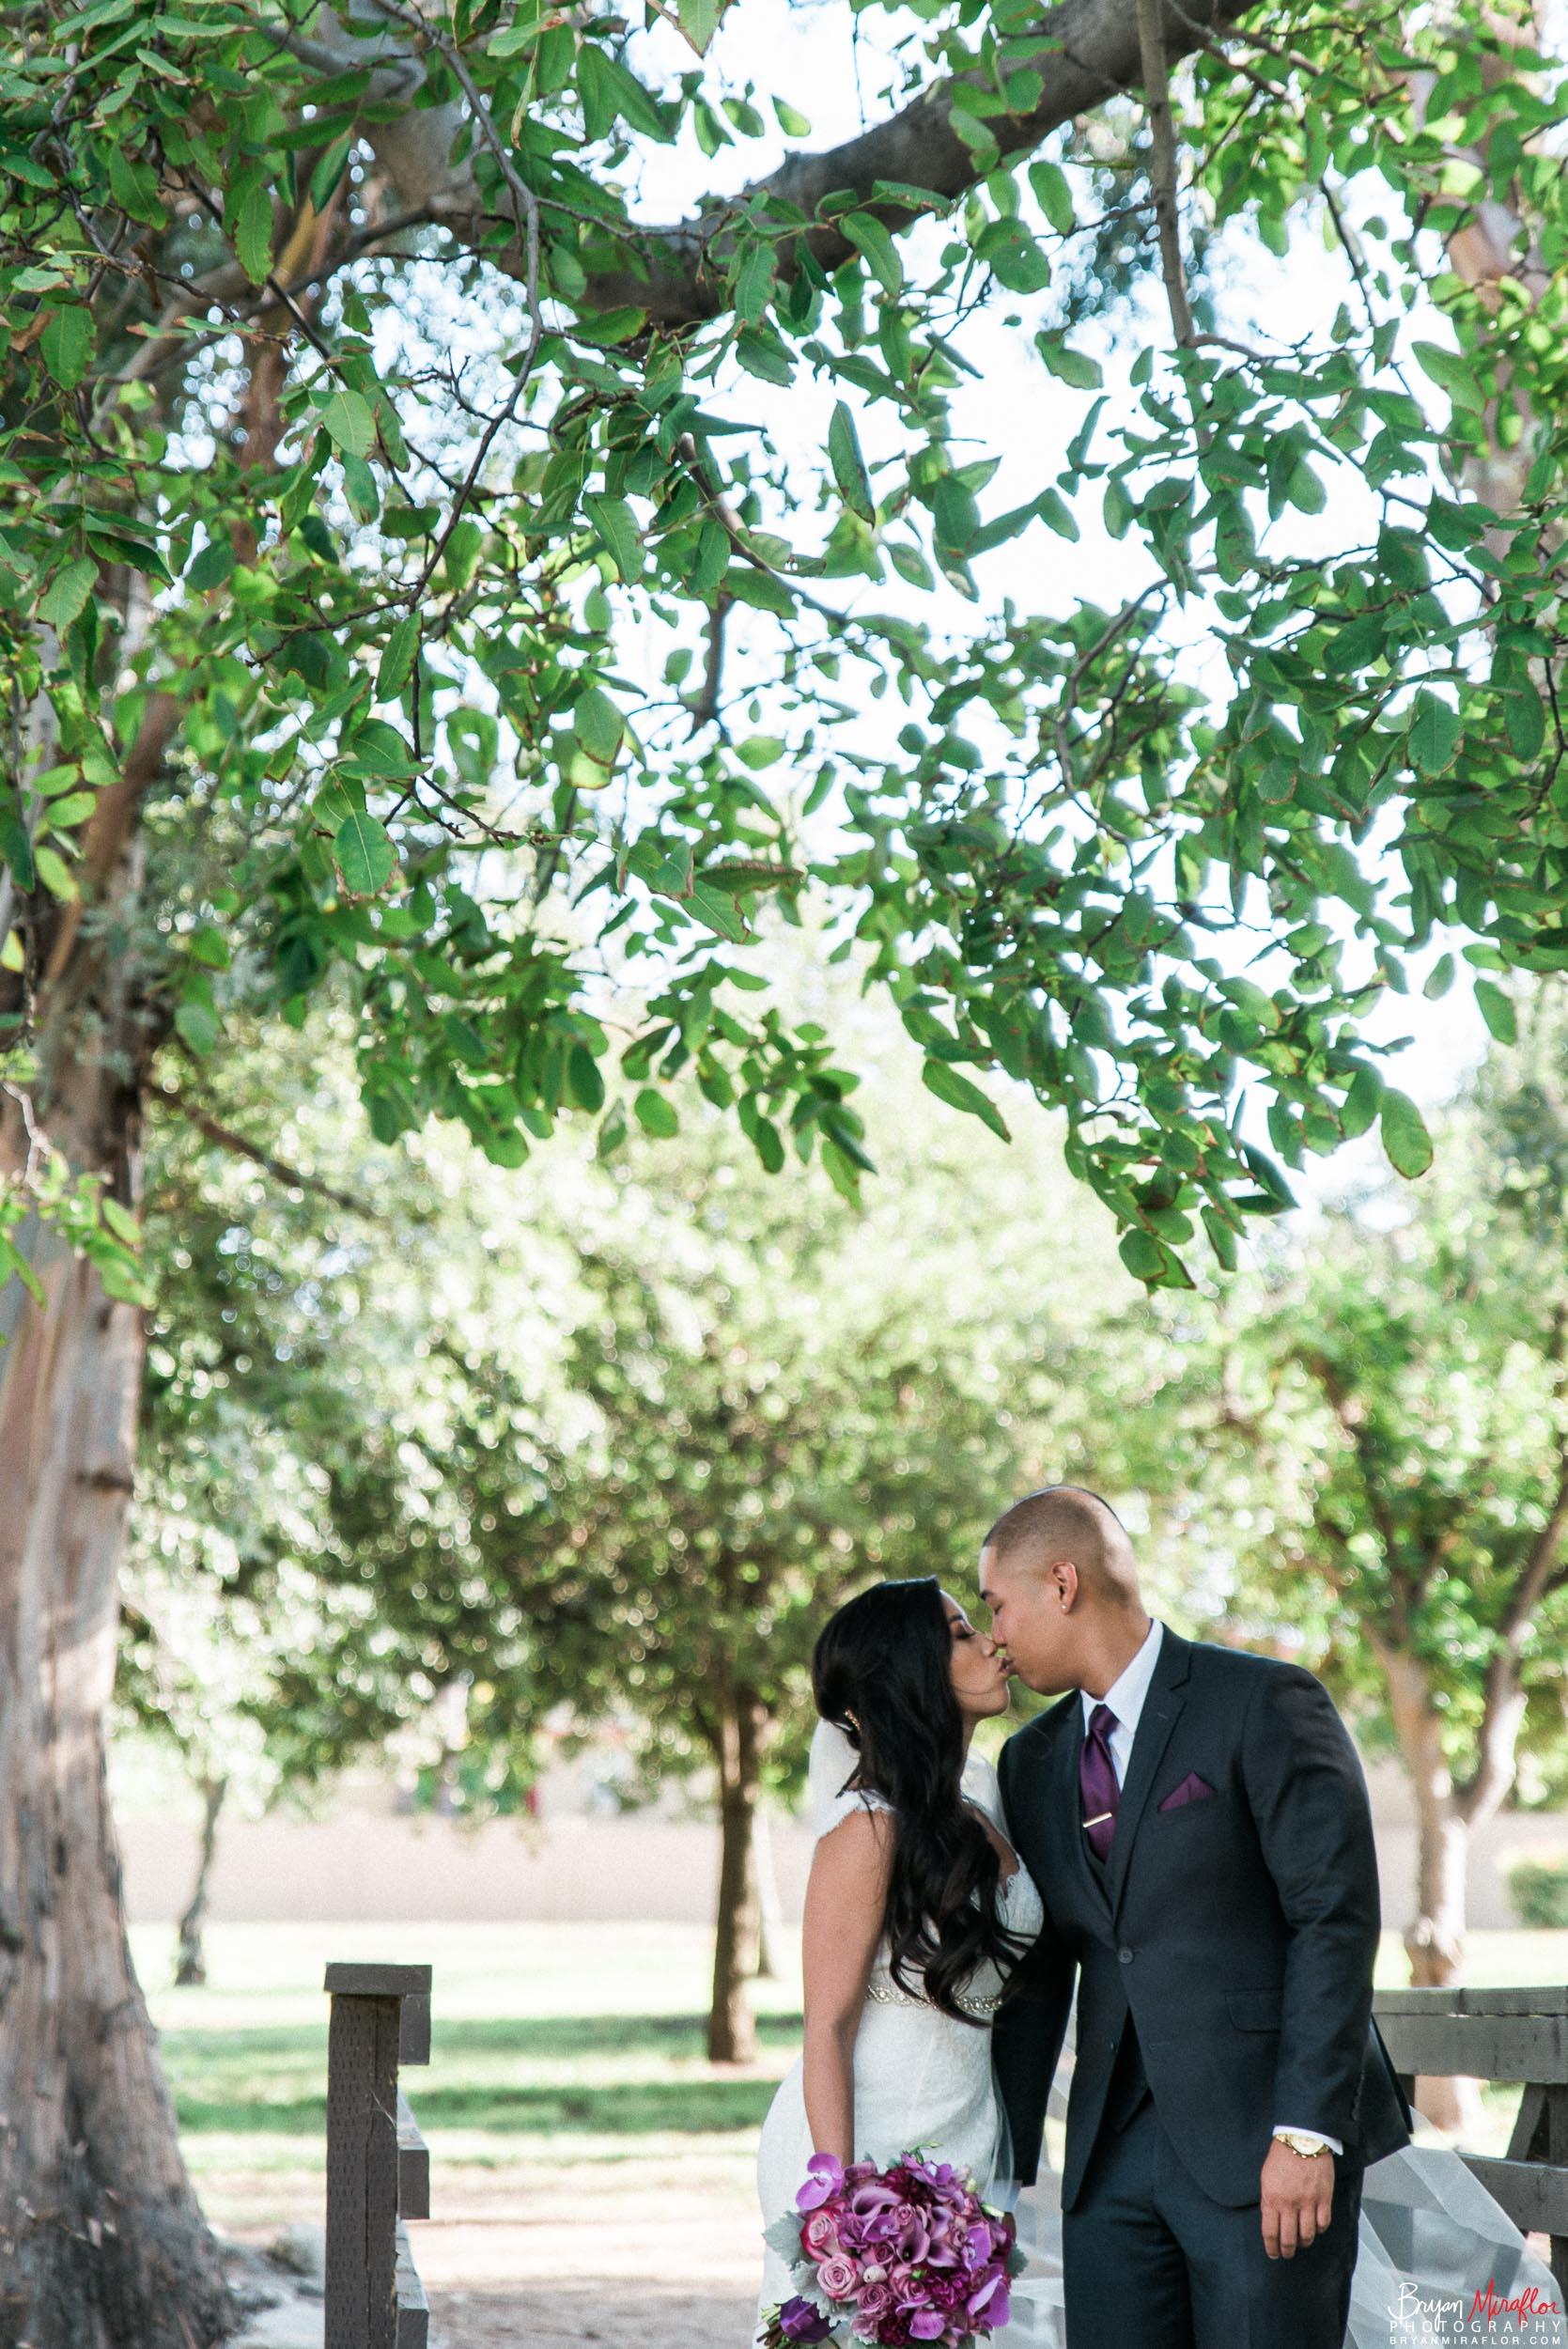 Bryan-Miraflor-Photography-Trisha-Dexter-Married-20170923-043.jpg